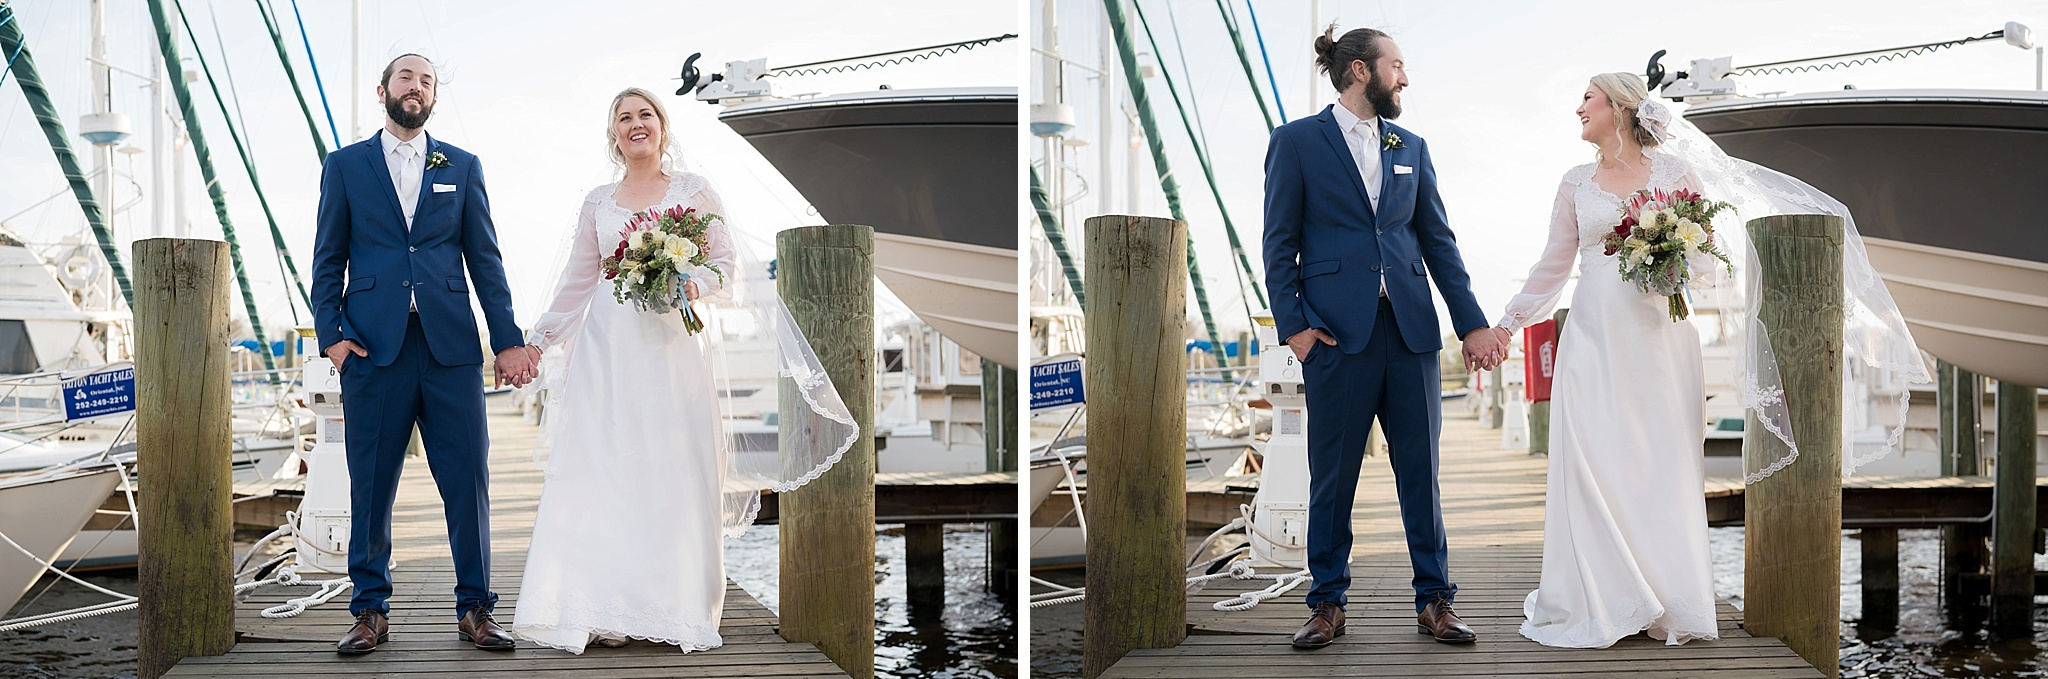 Washington-NC-Wedding-Photography-208.jpg